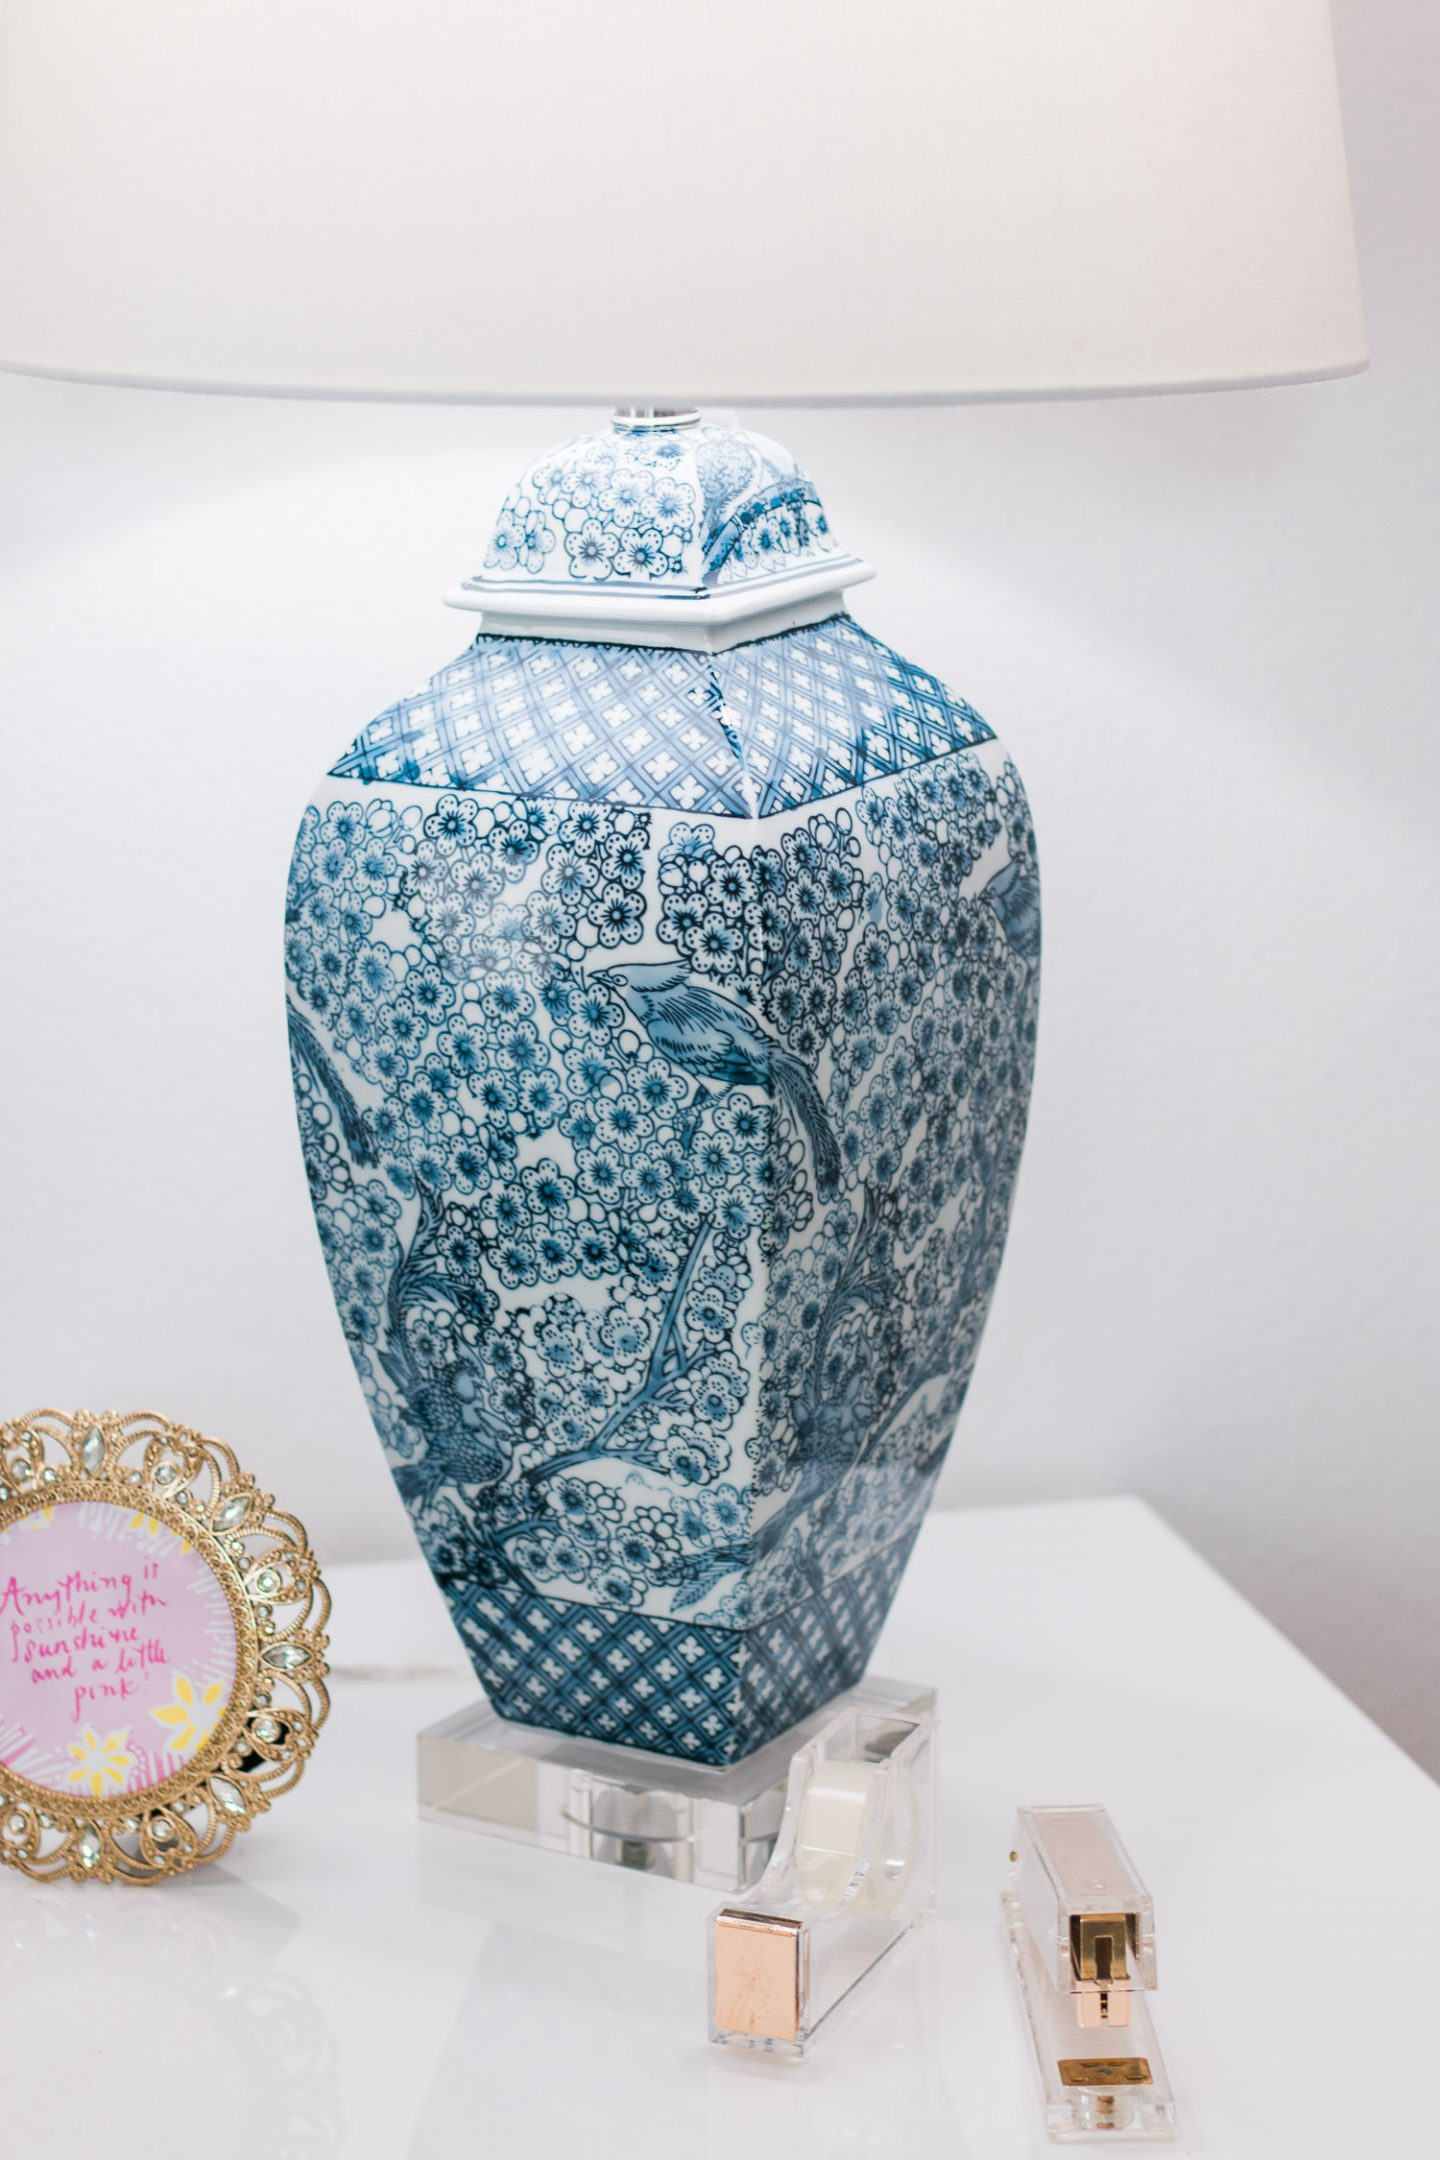 valspar home office tour ashley brooke nicholas cute office inspiration target style blue lamp